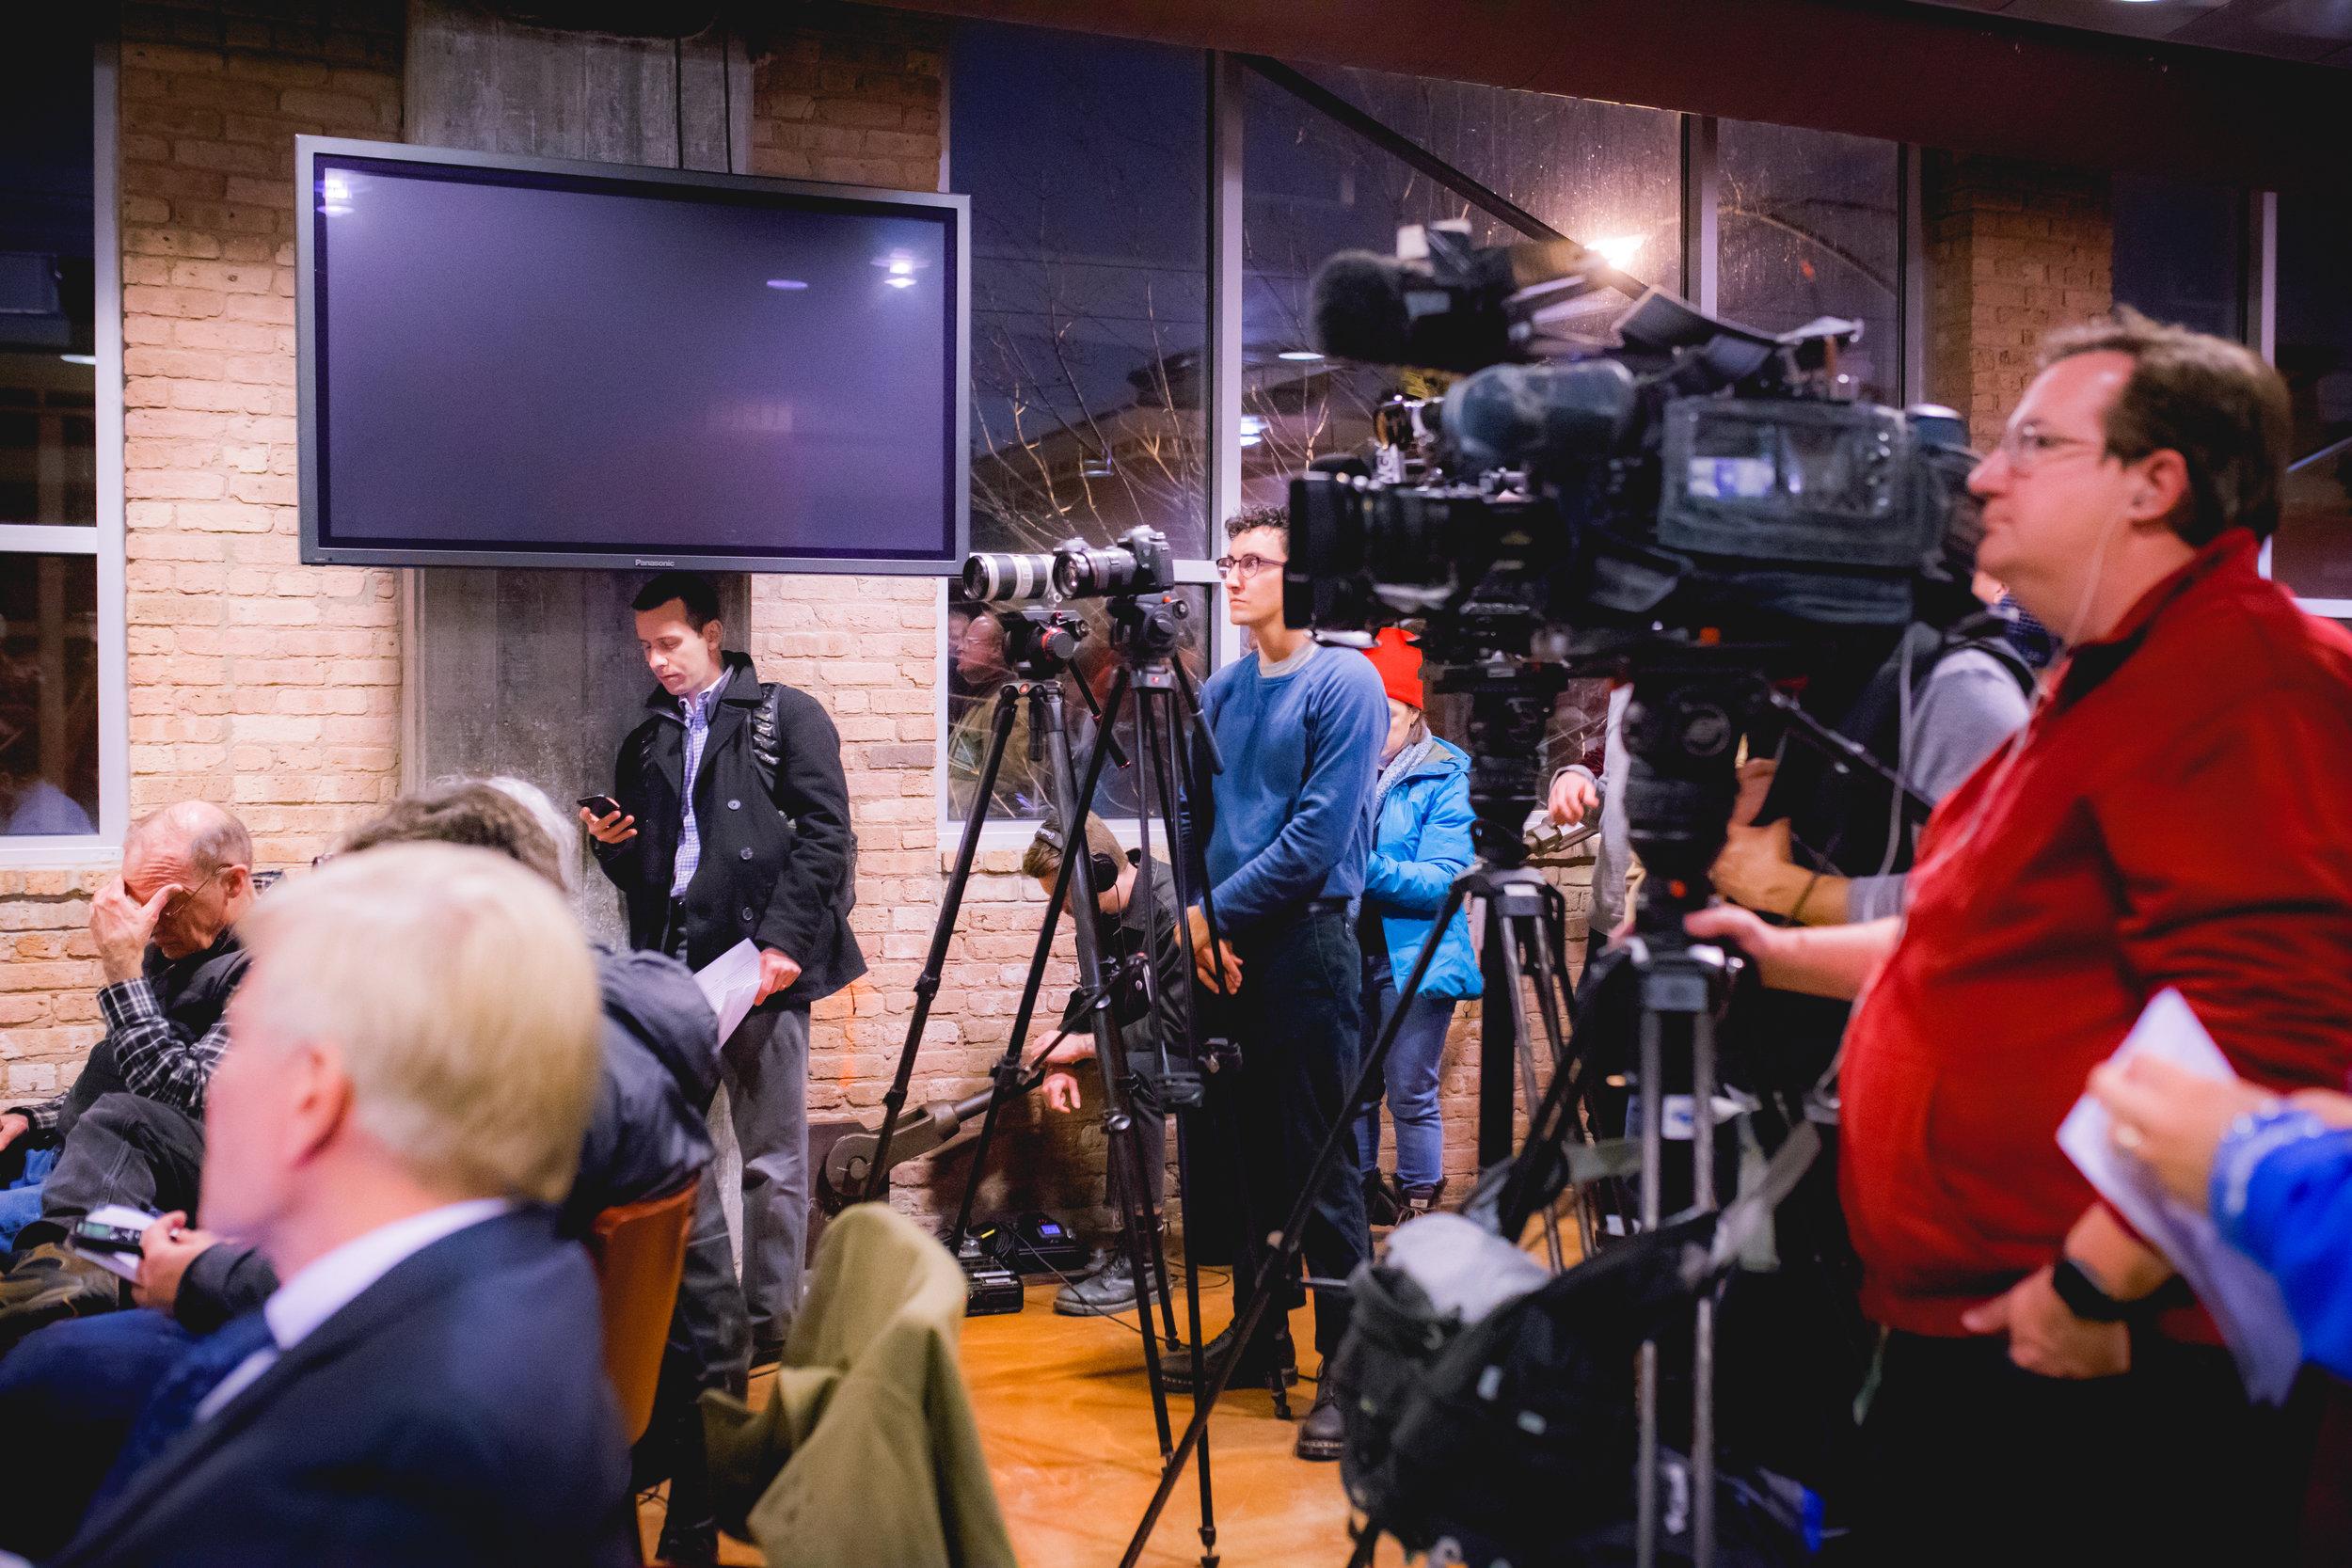 104_CIVL_PressConference_11.29.2018.jpg